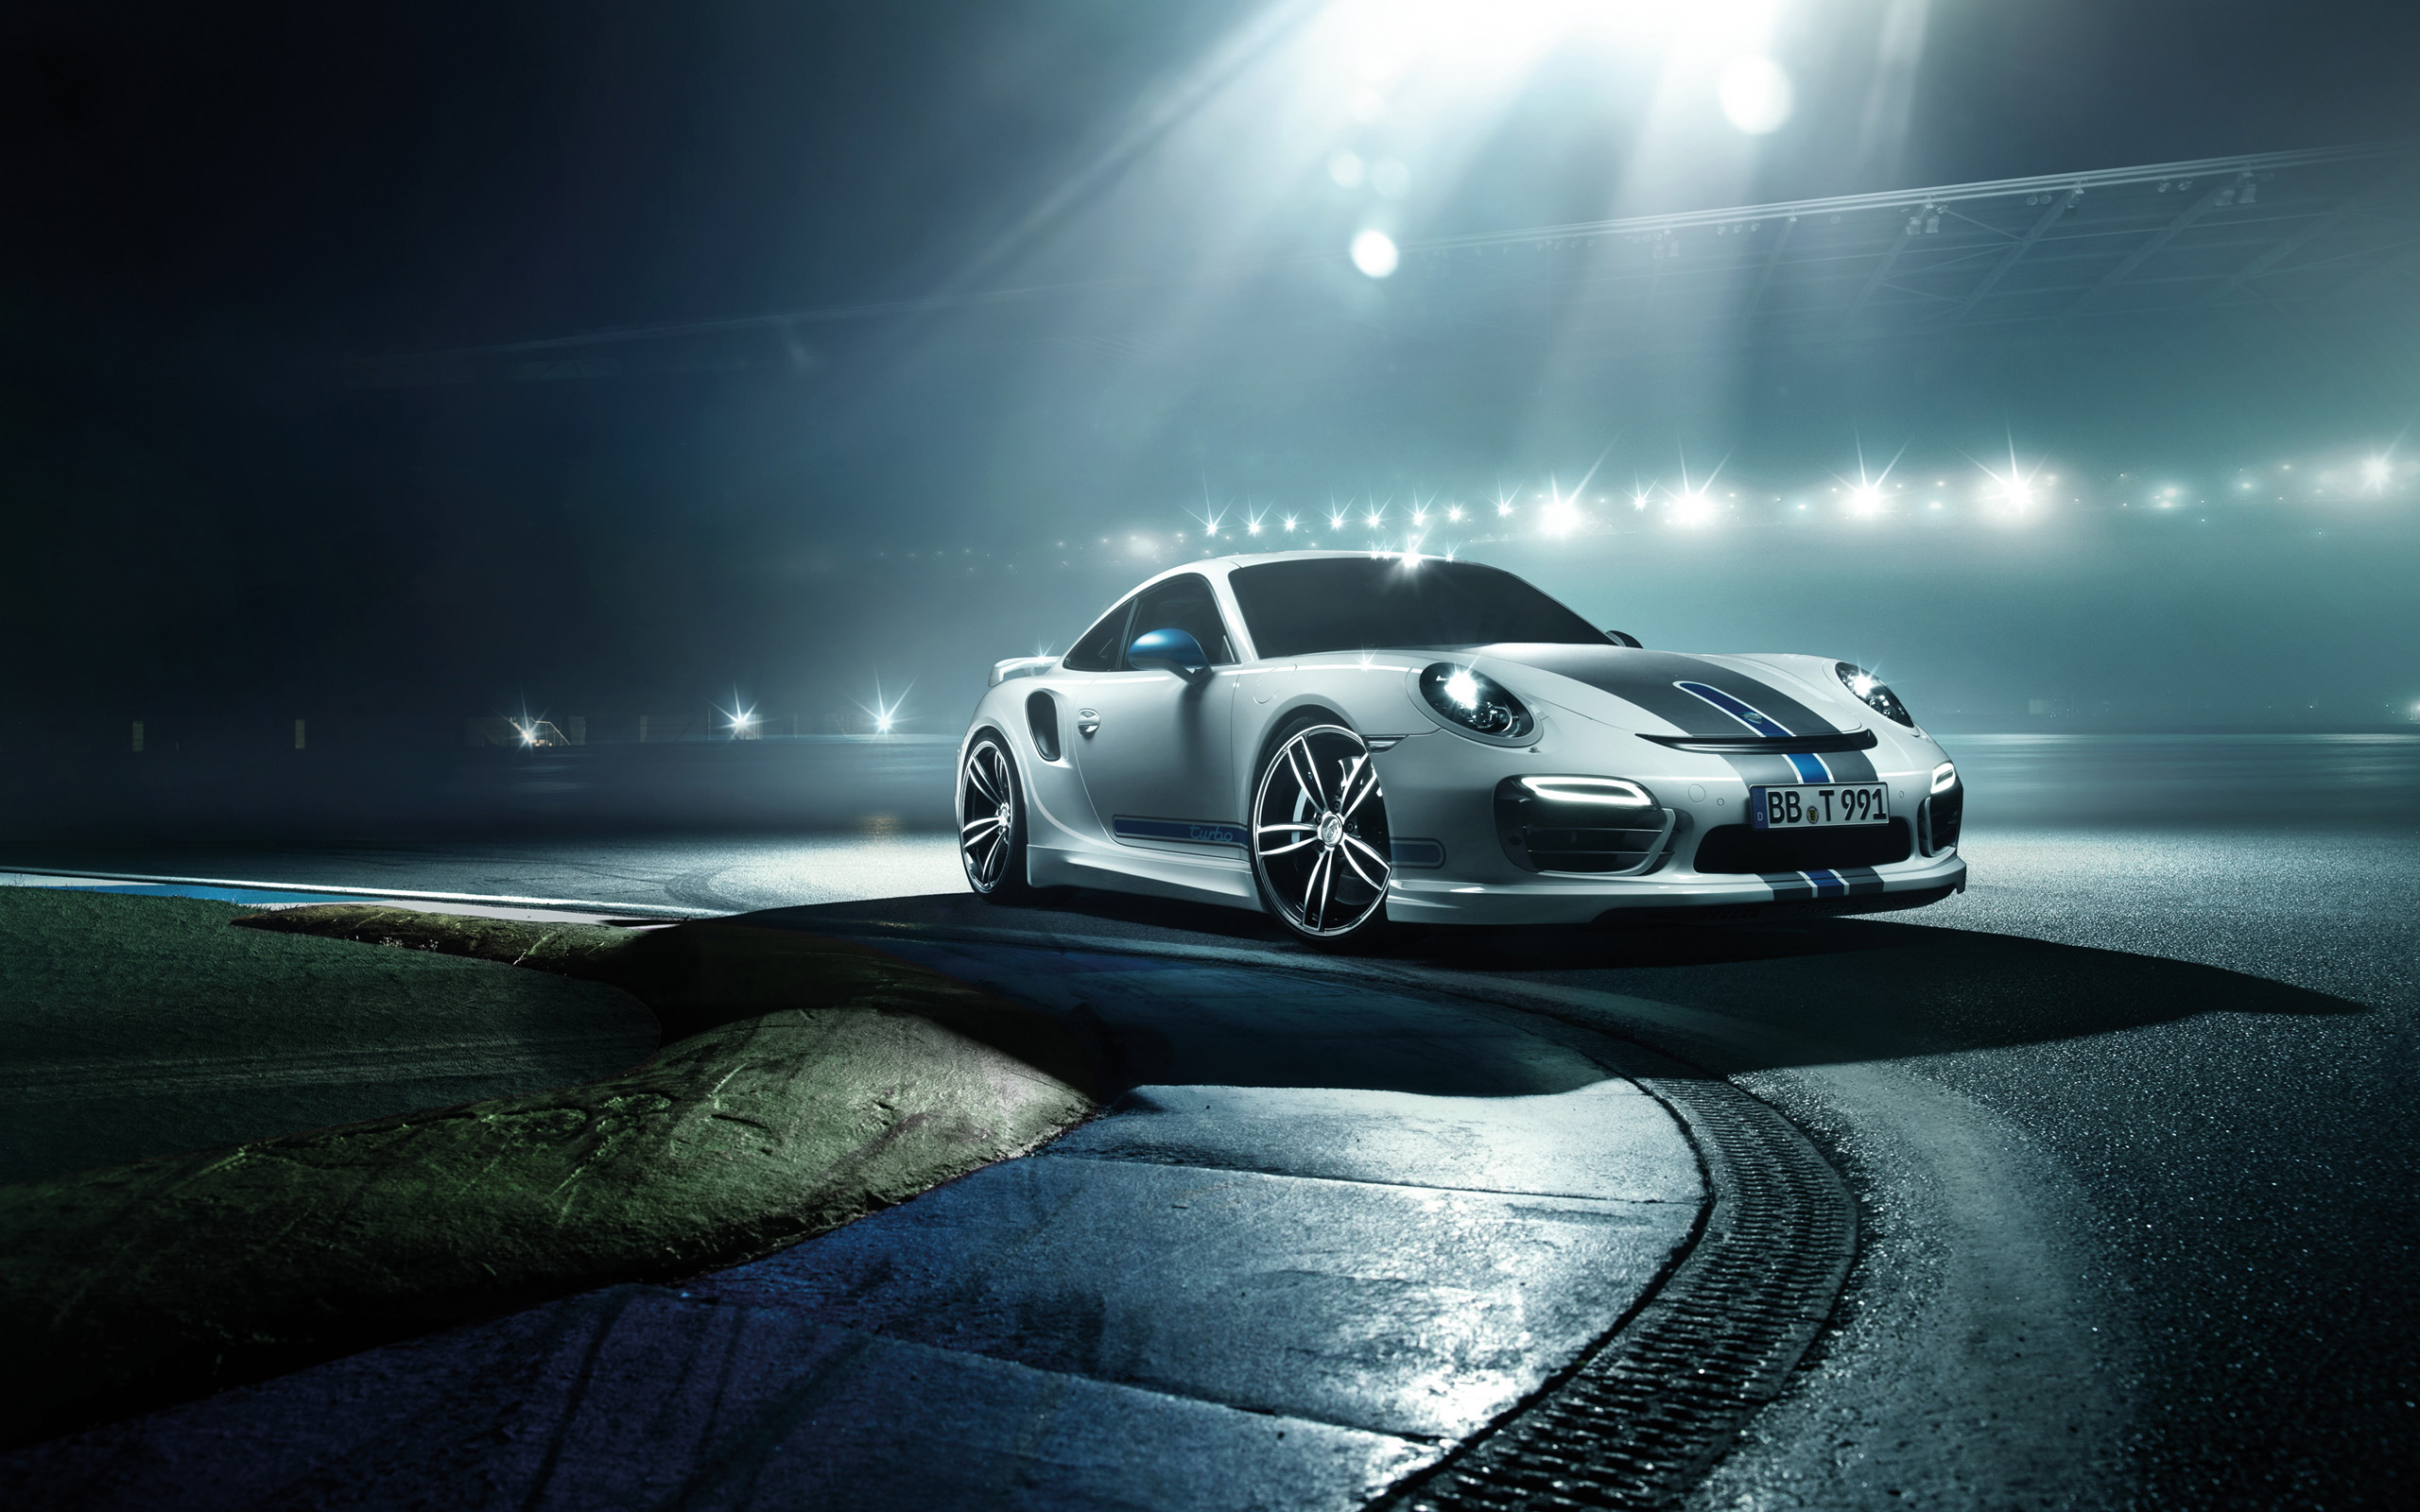 2014 Porsche 911 Turbo By TechArt Wallpapers | HD Wallpapers HTML code